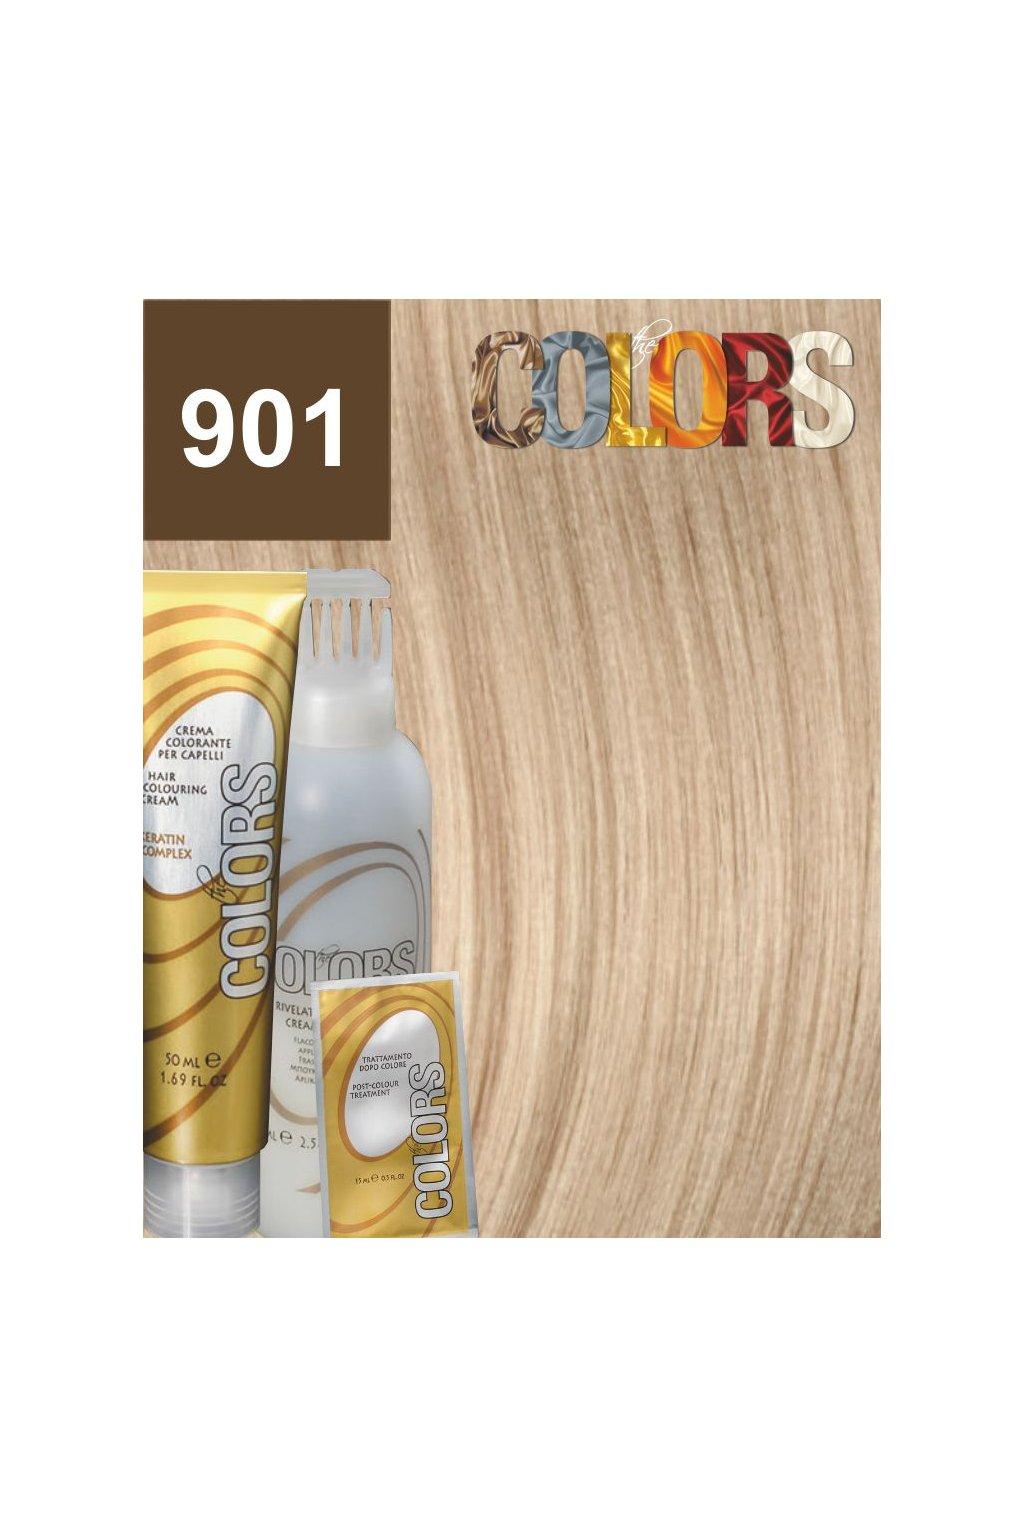 901 mo ker